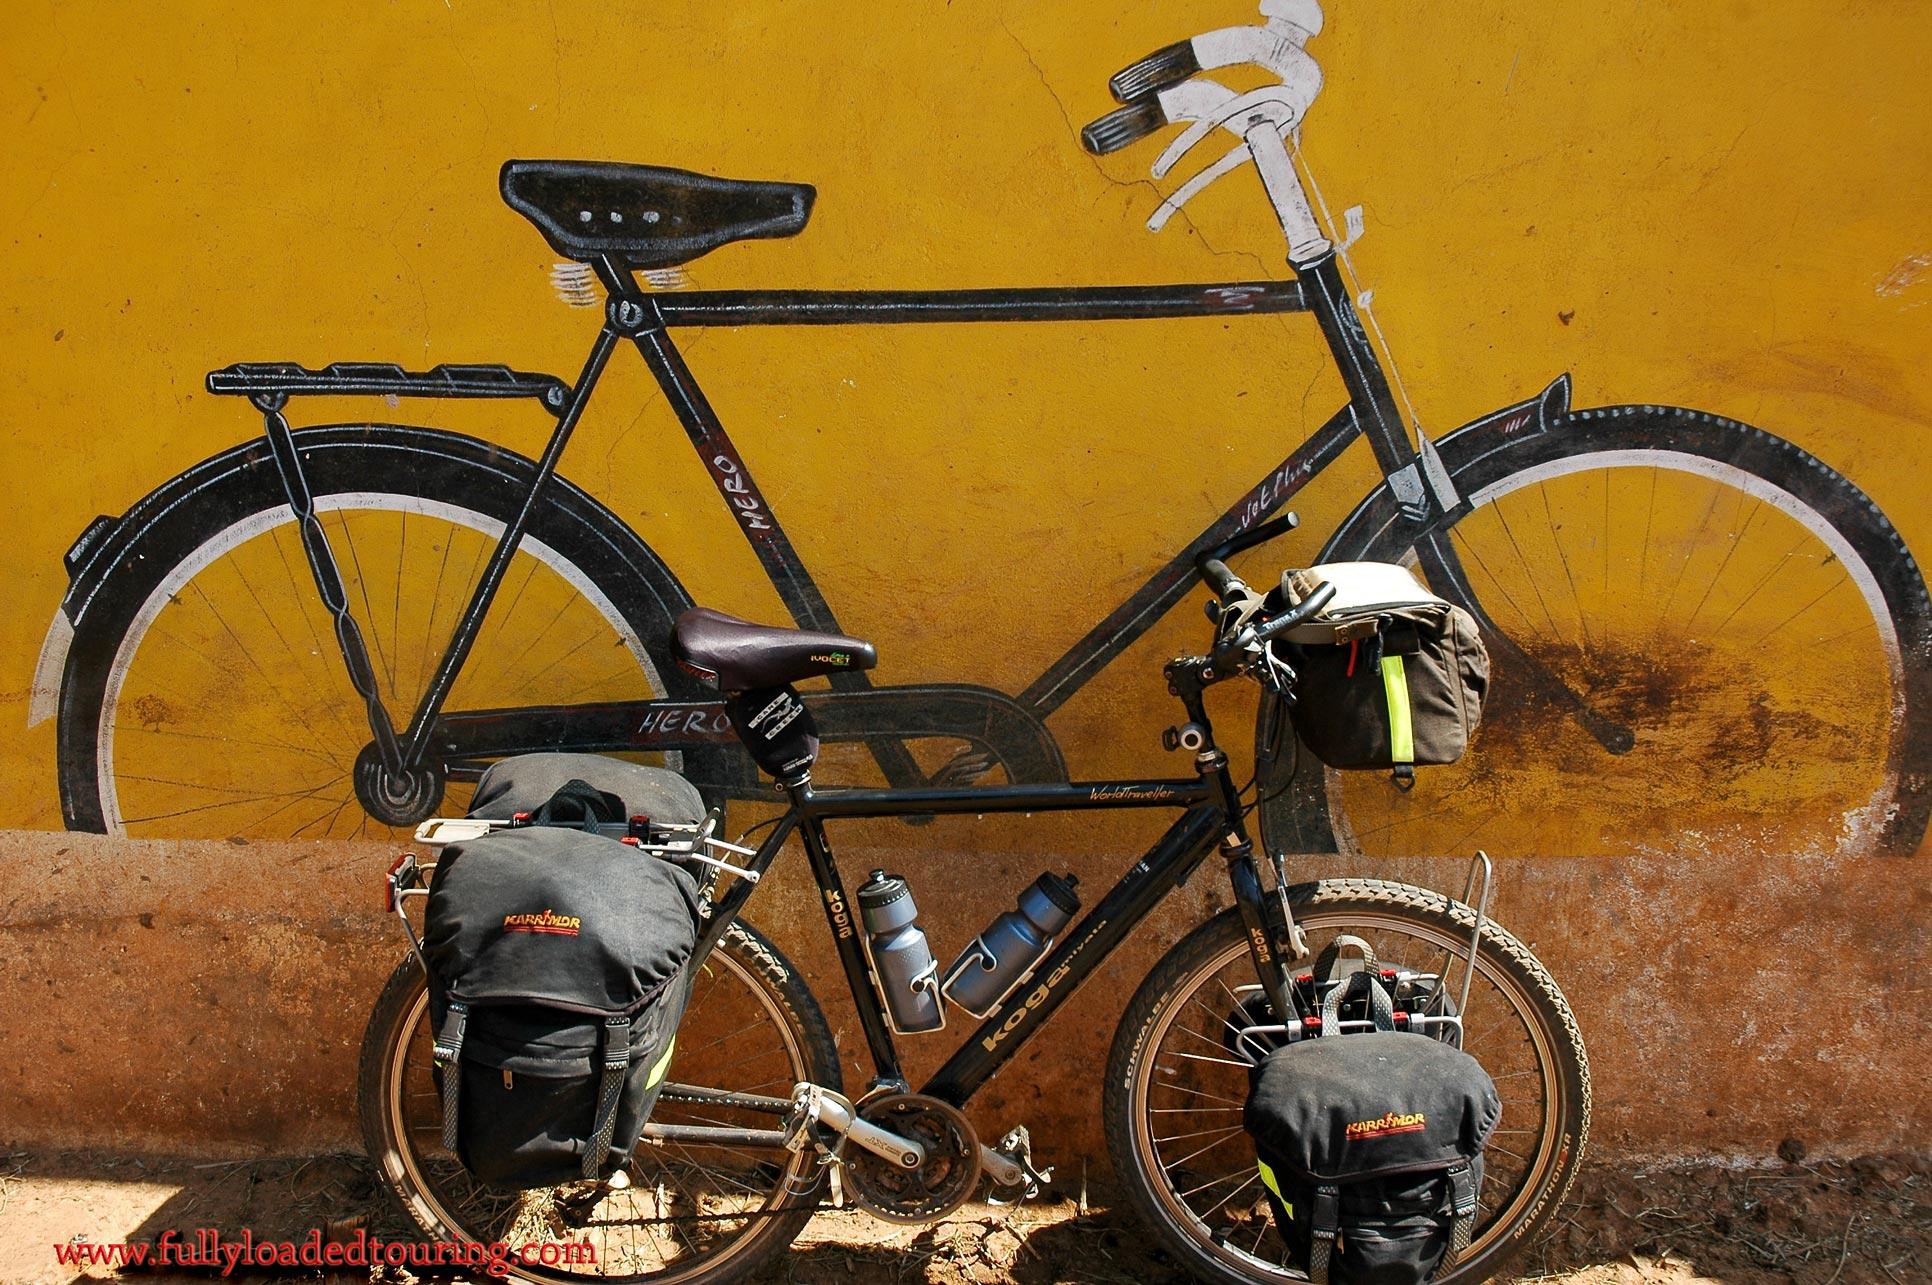 328    Grace - Touring India - Koga Miyata World Traveller touring bike